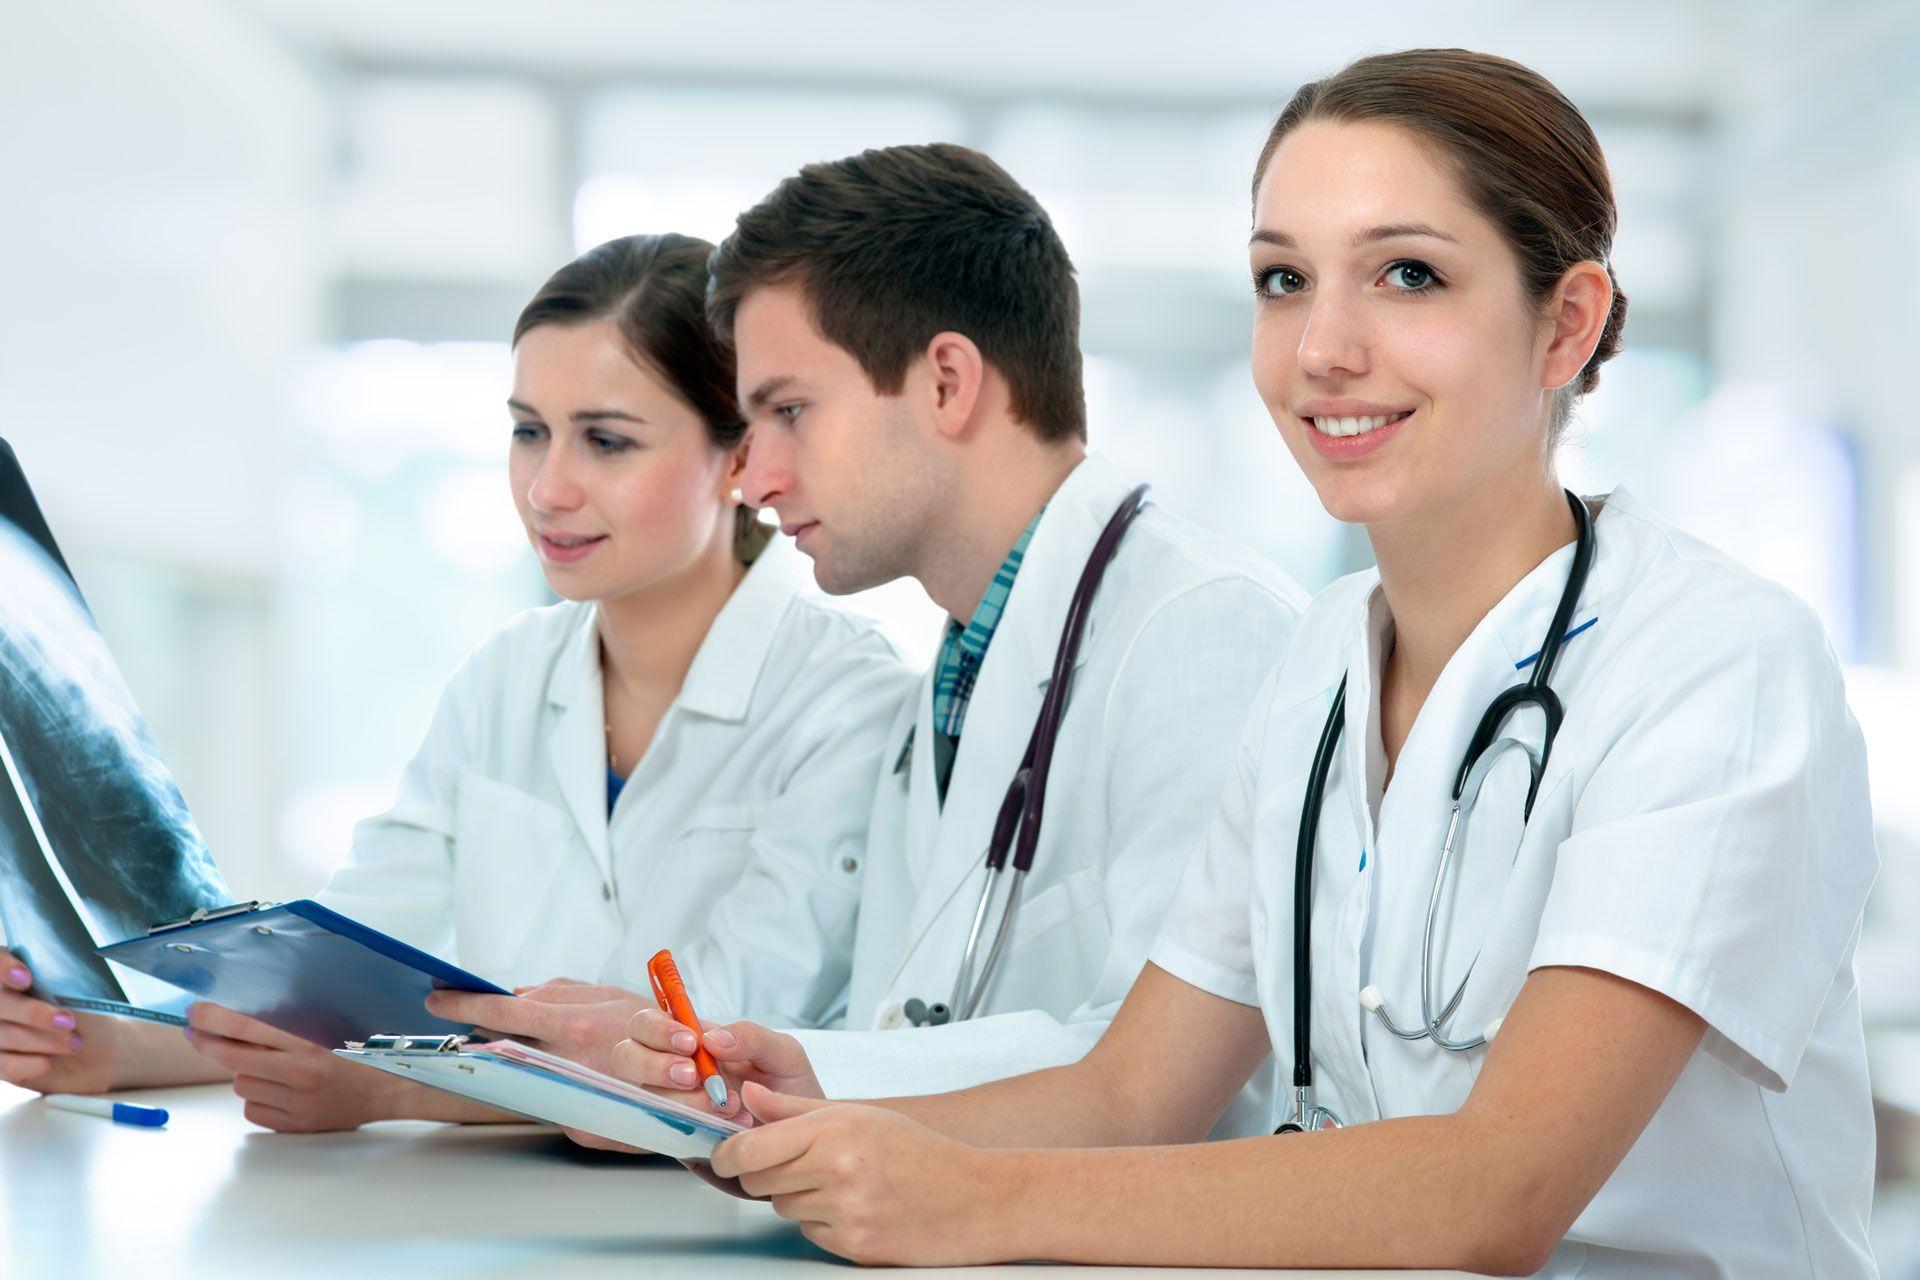 Nurse Training Programmes Pin It Share Nurse Nurses